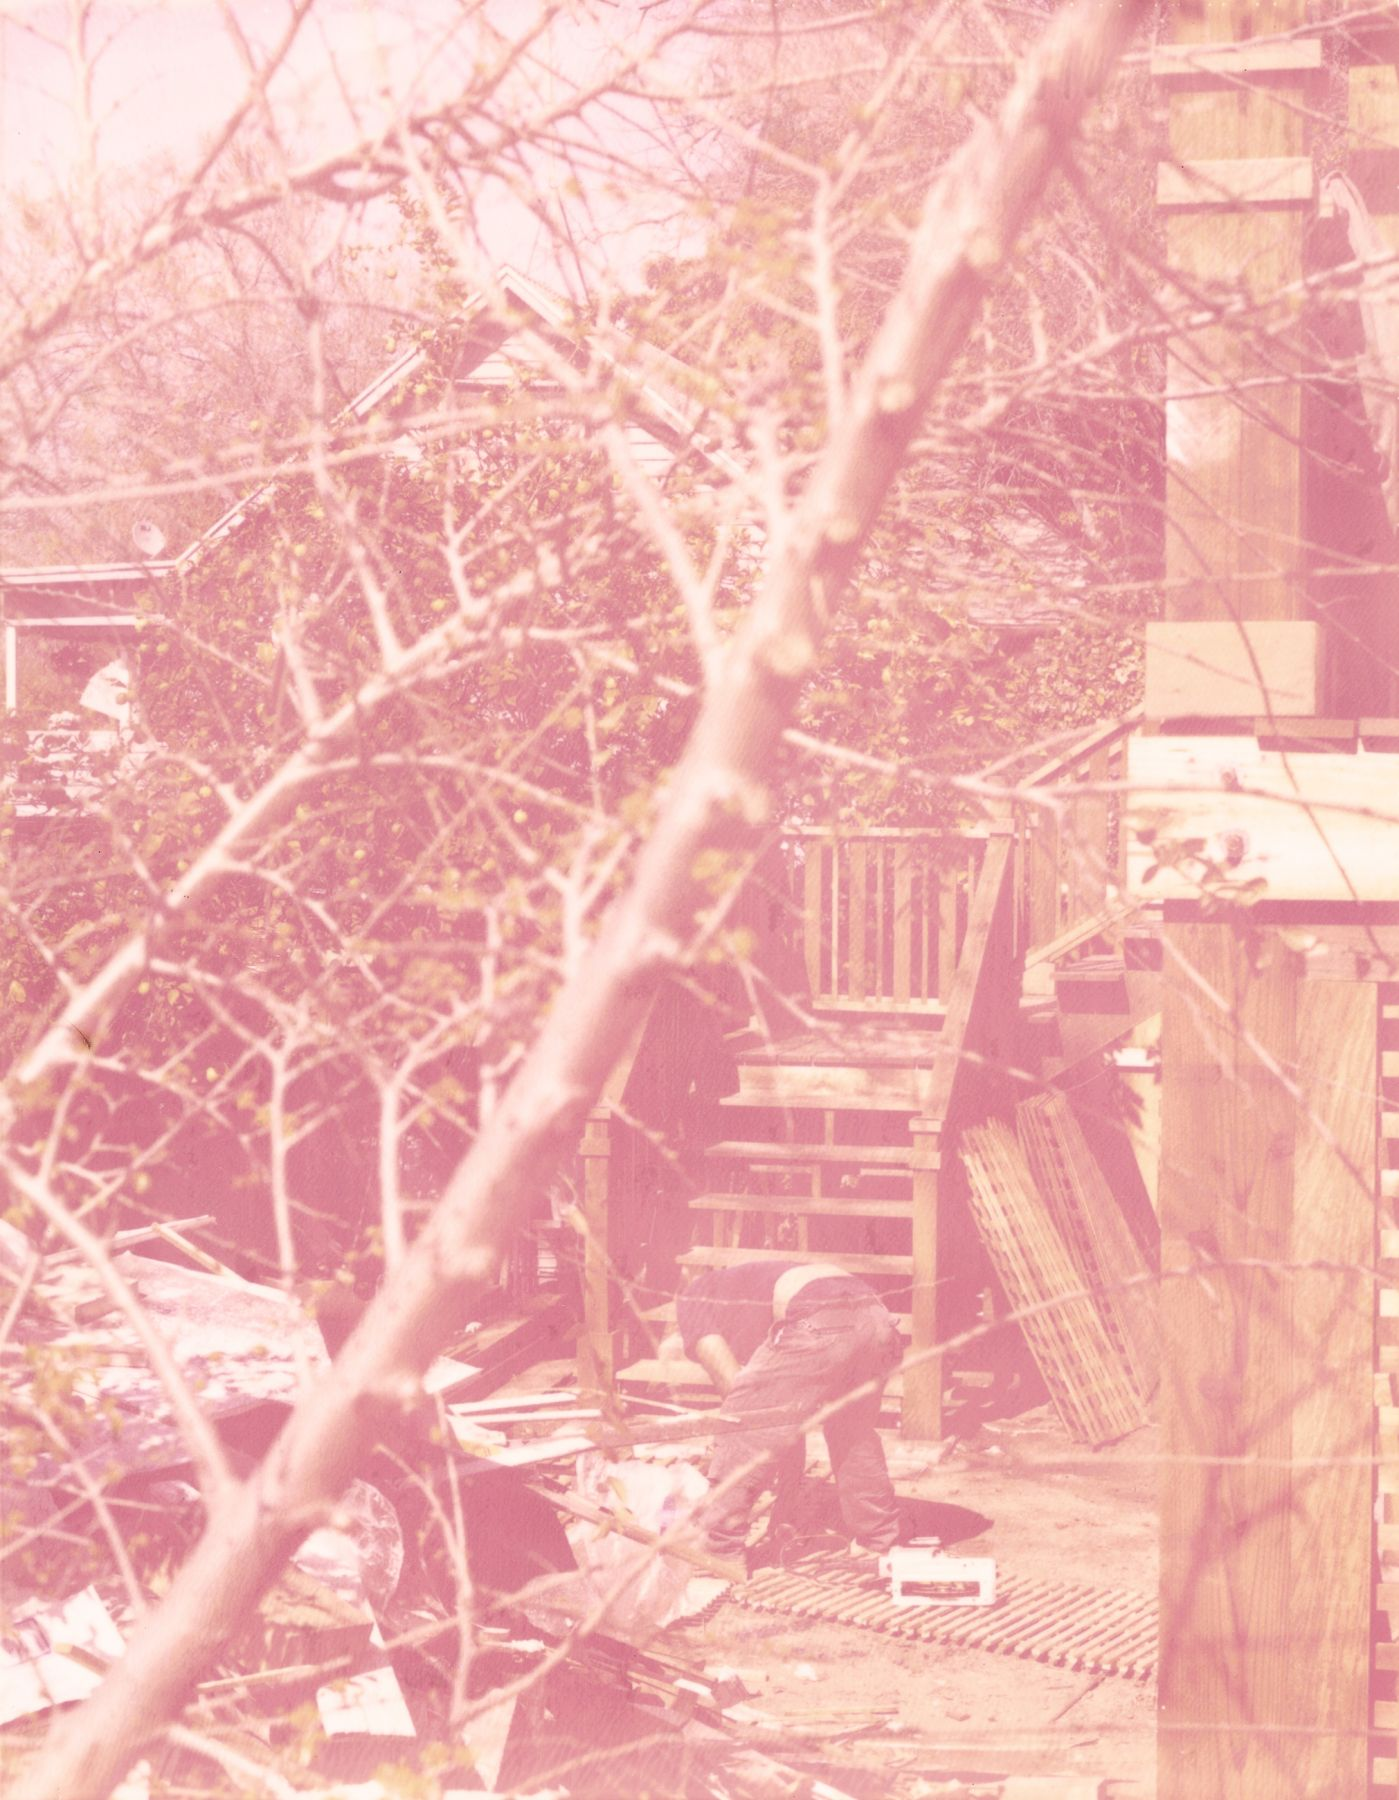 Roe Ethridge, LA Backyard (Polaroid), 2006-2007, C-print, 30.5 x 24.5 inches